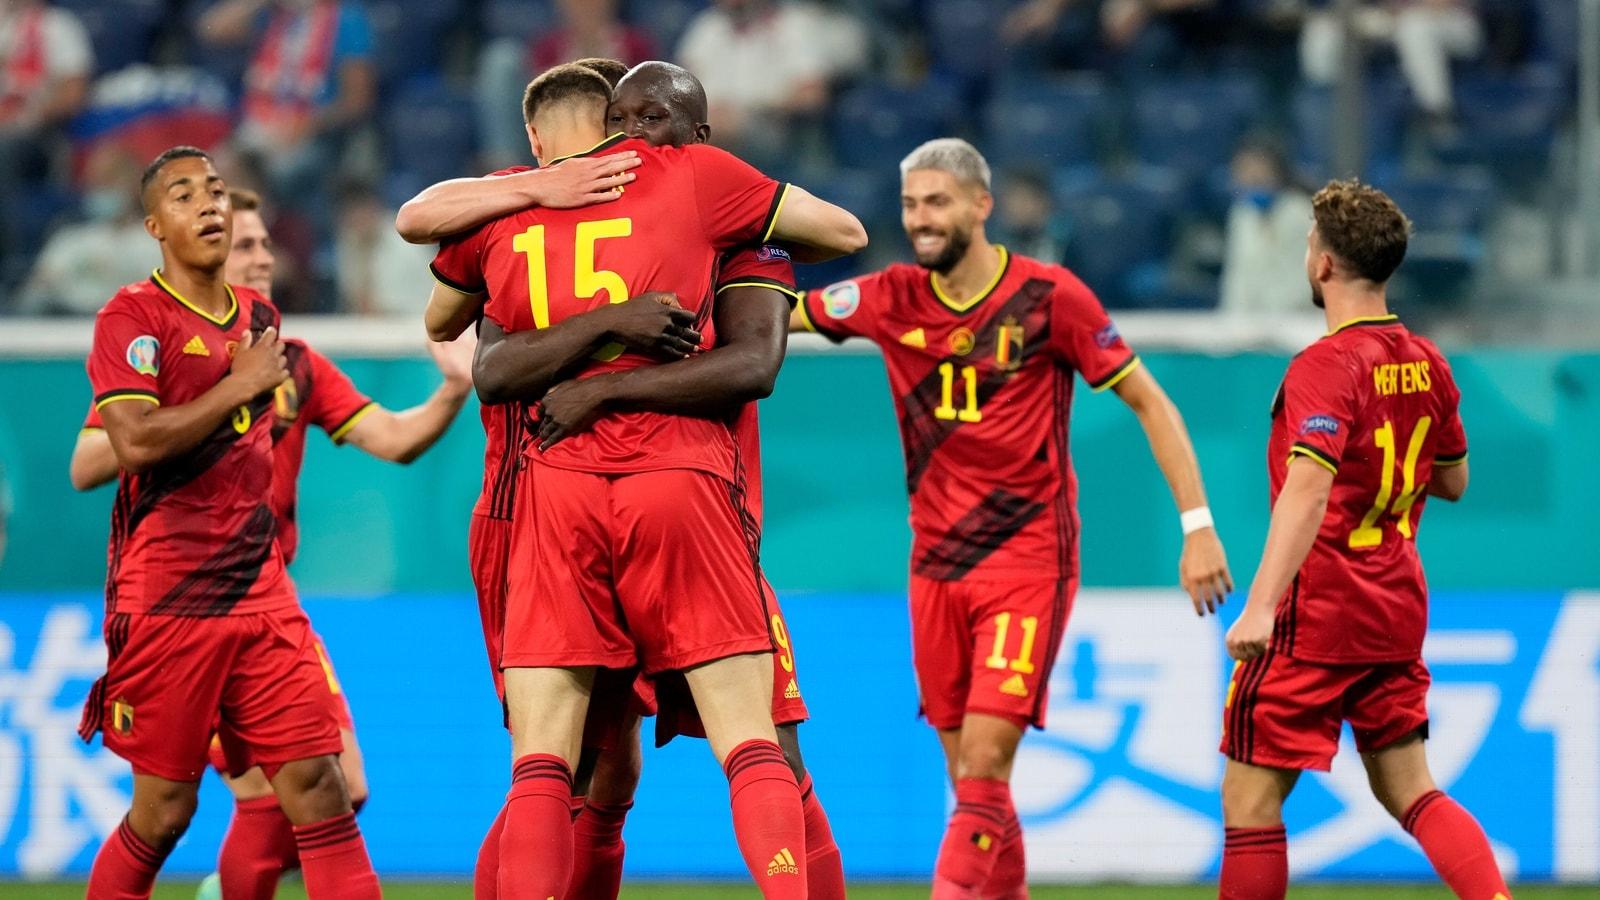 UEFA Euro 2020 Belgium vs Russia Highlights: Lukaku stars in Belgium's 3-0 win over Russia